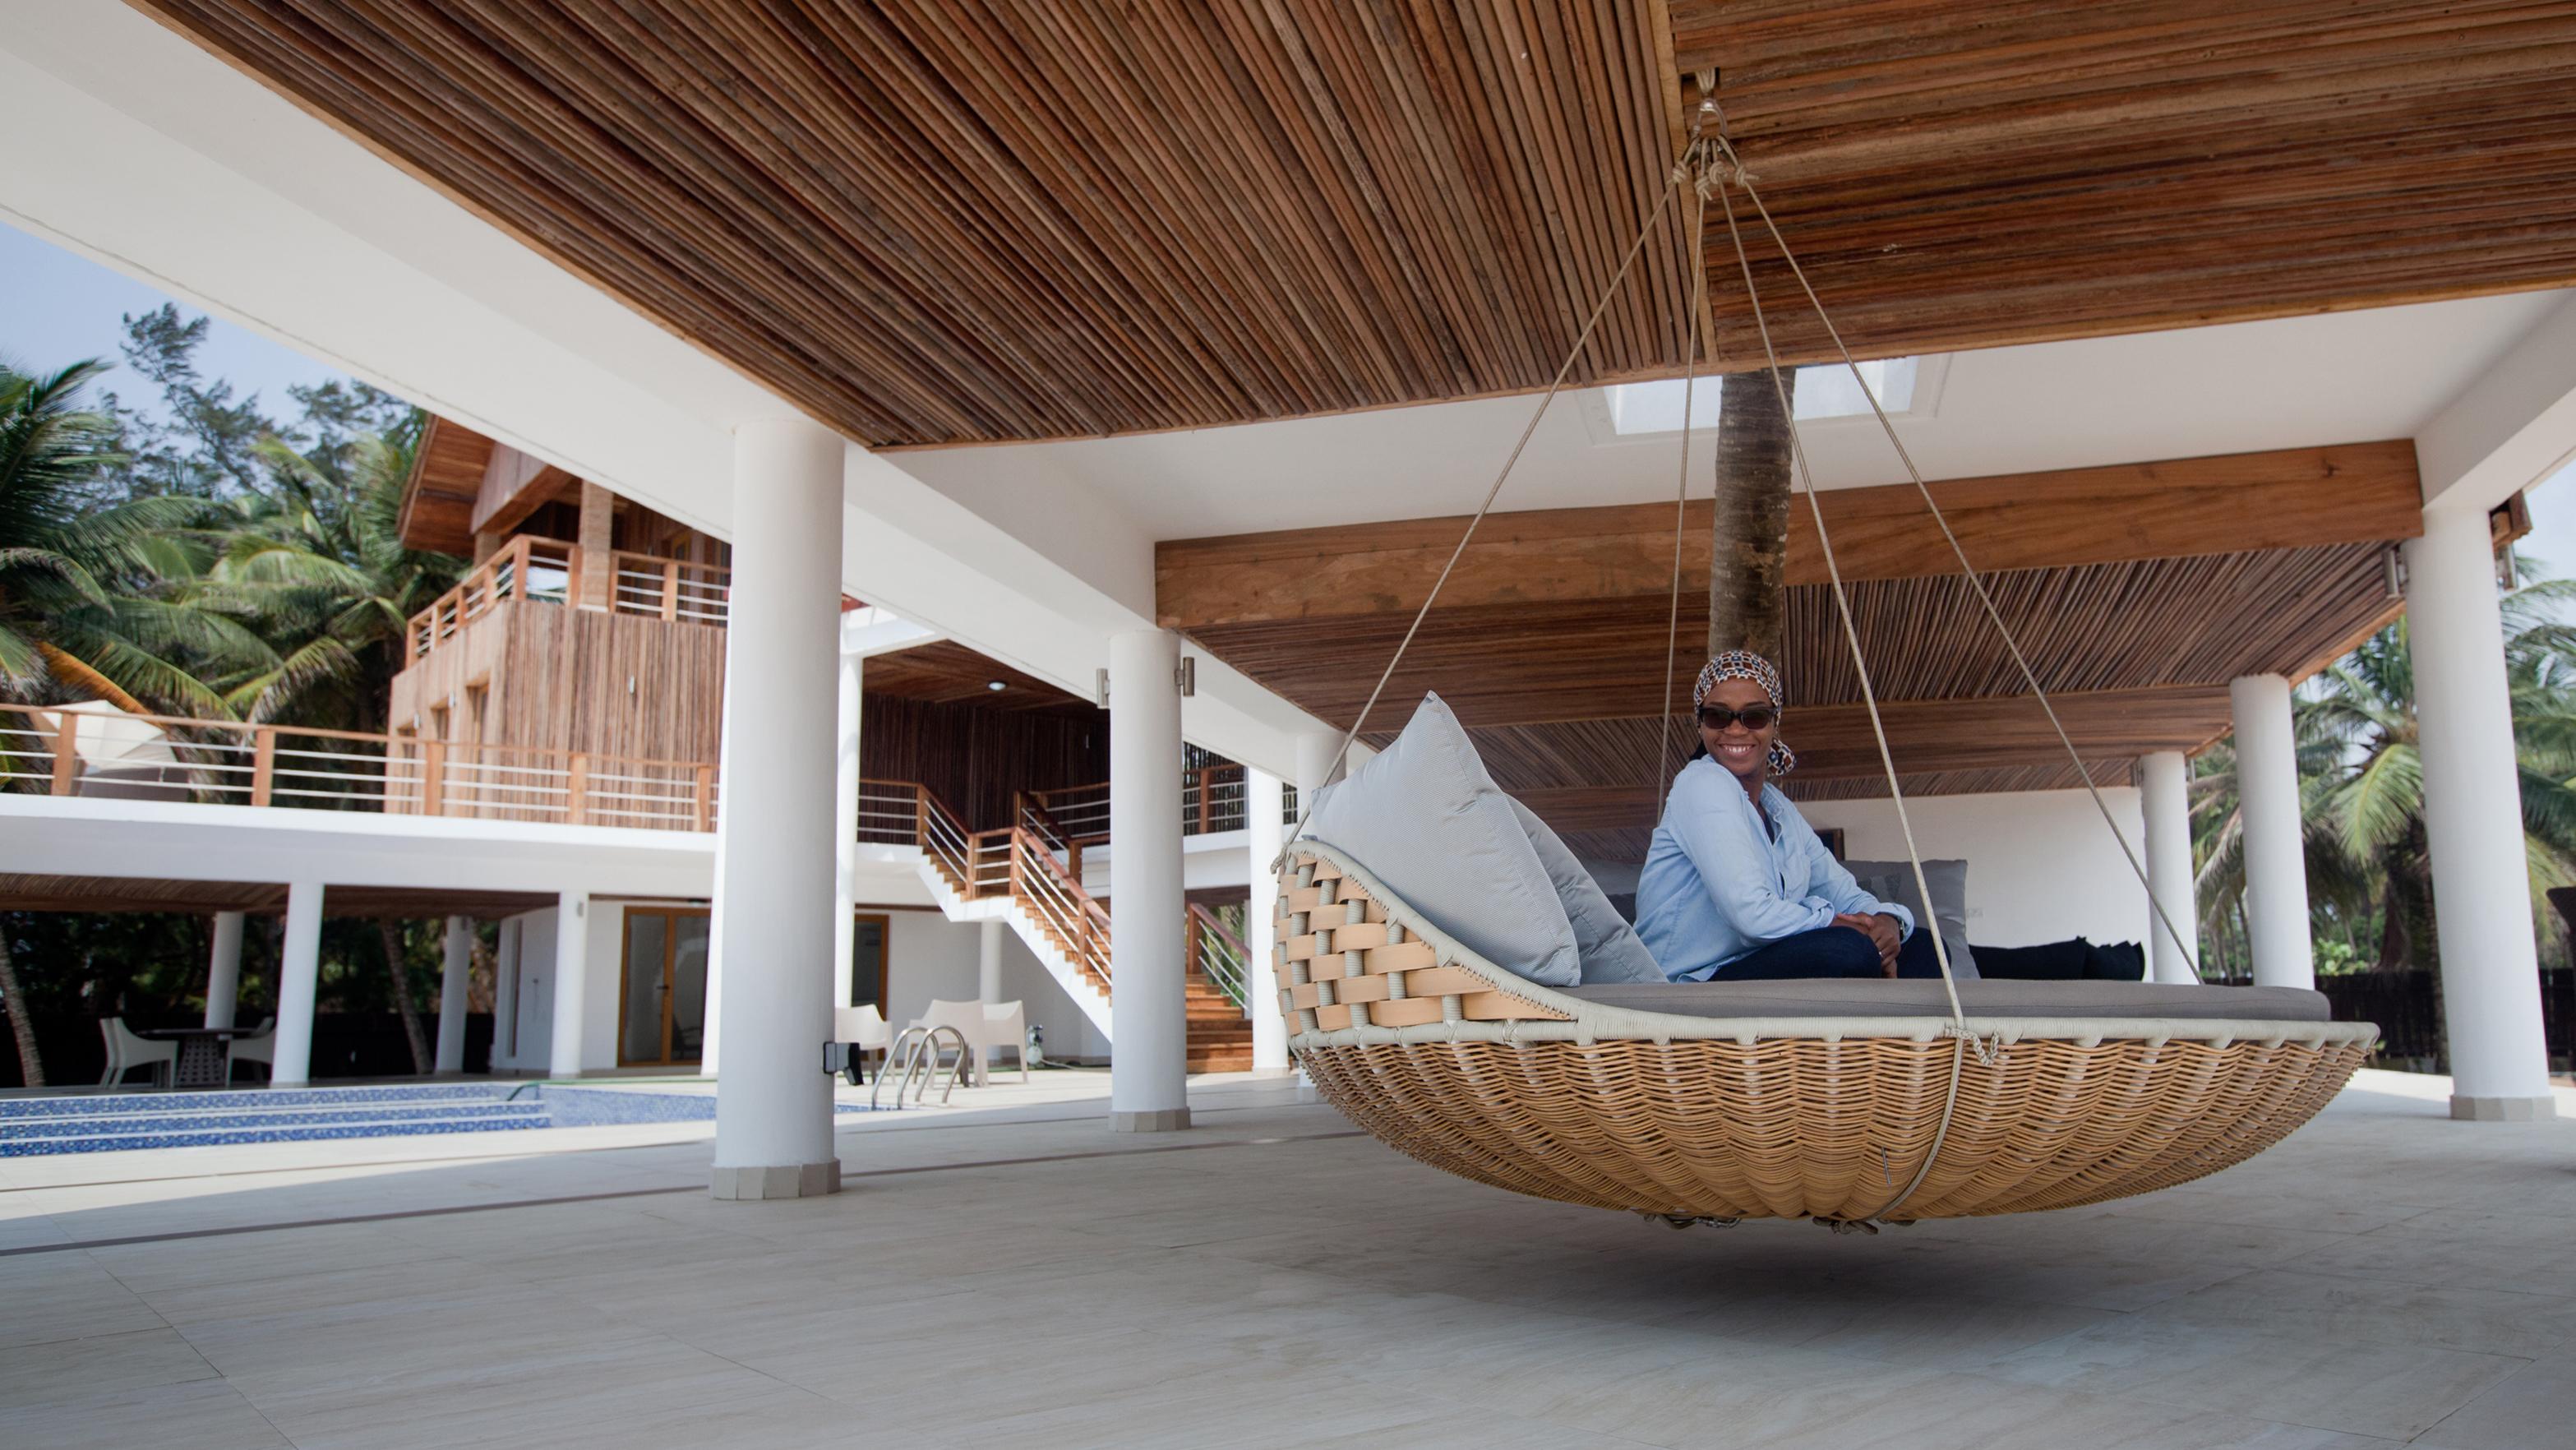 PRIVATE BEACH HOUSE INTERIOR 5